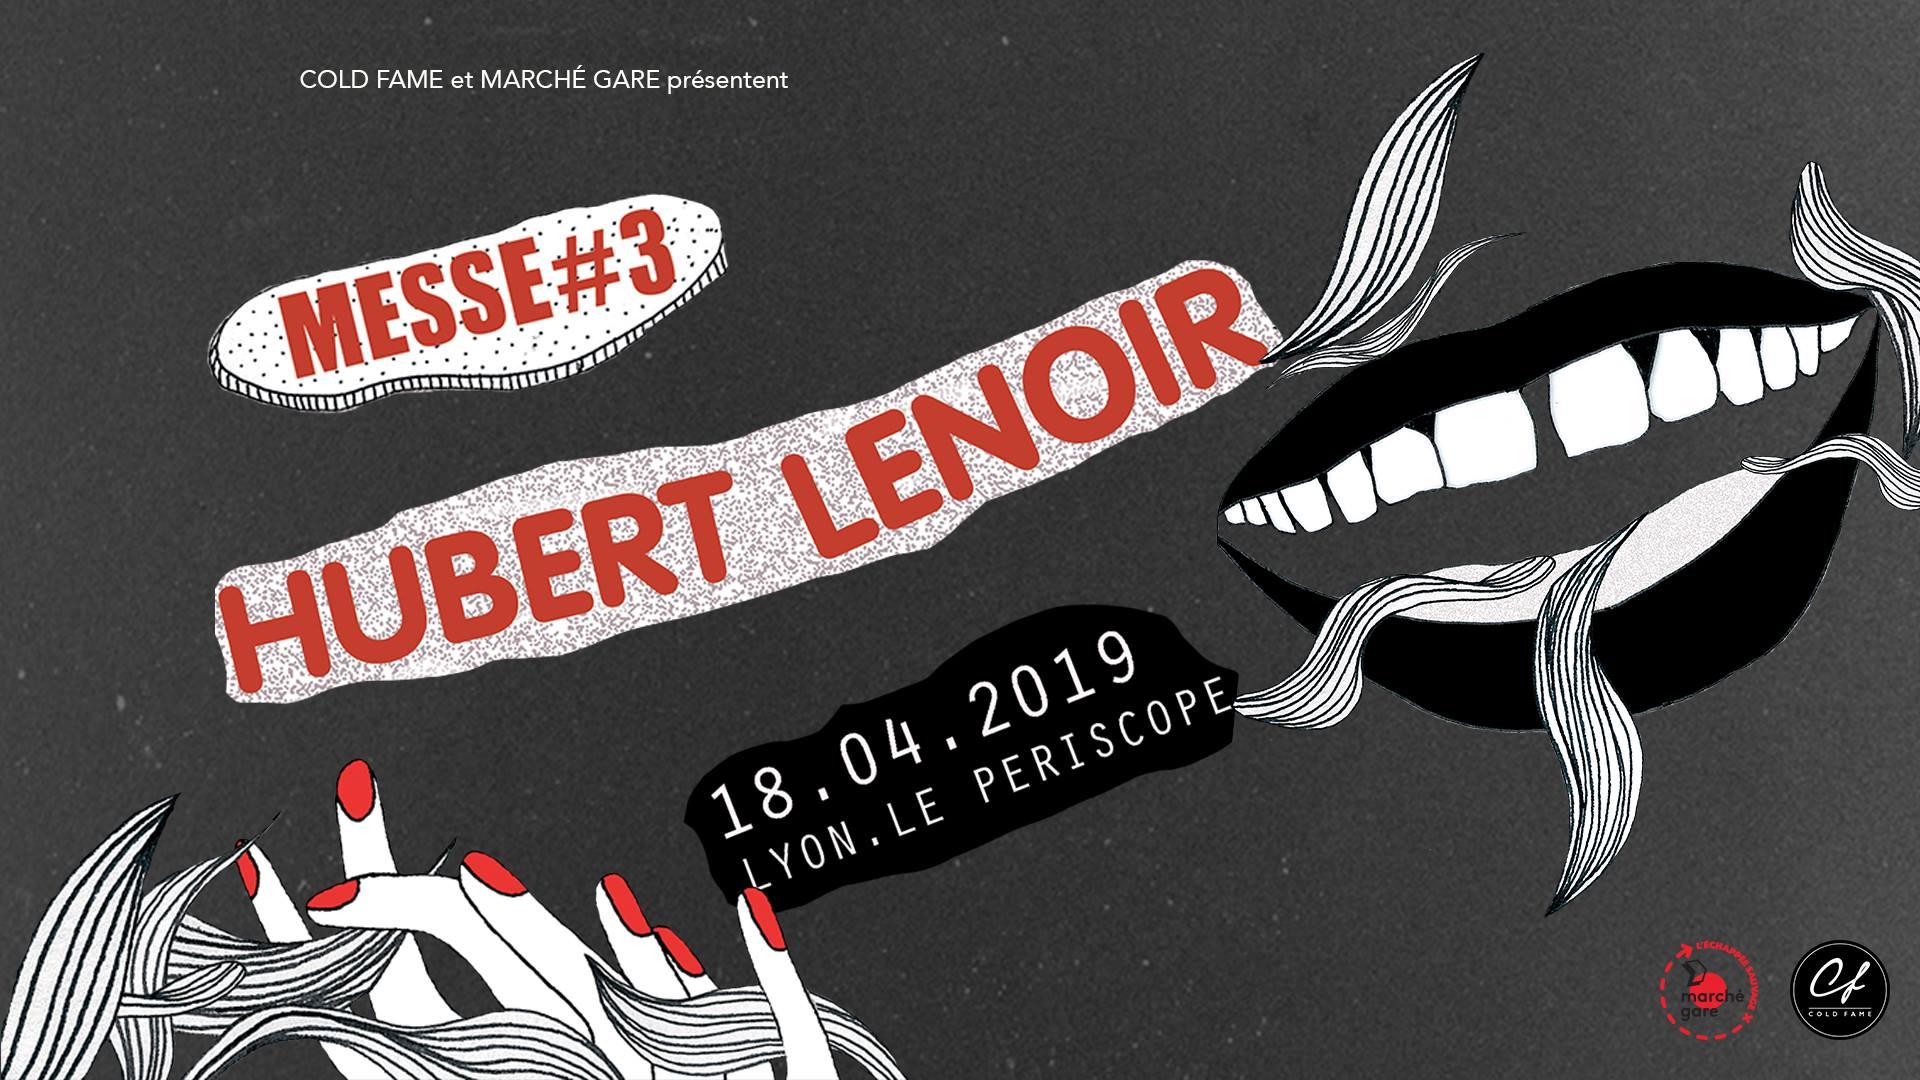 18/04 - Periscope/Lyon